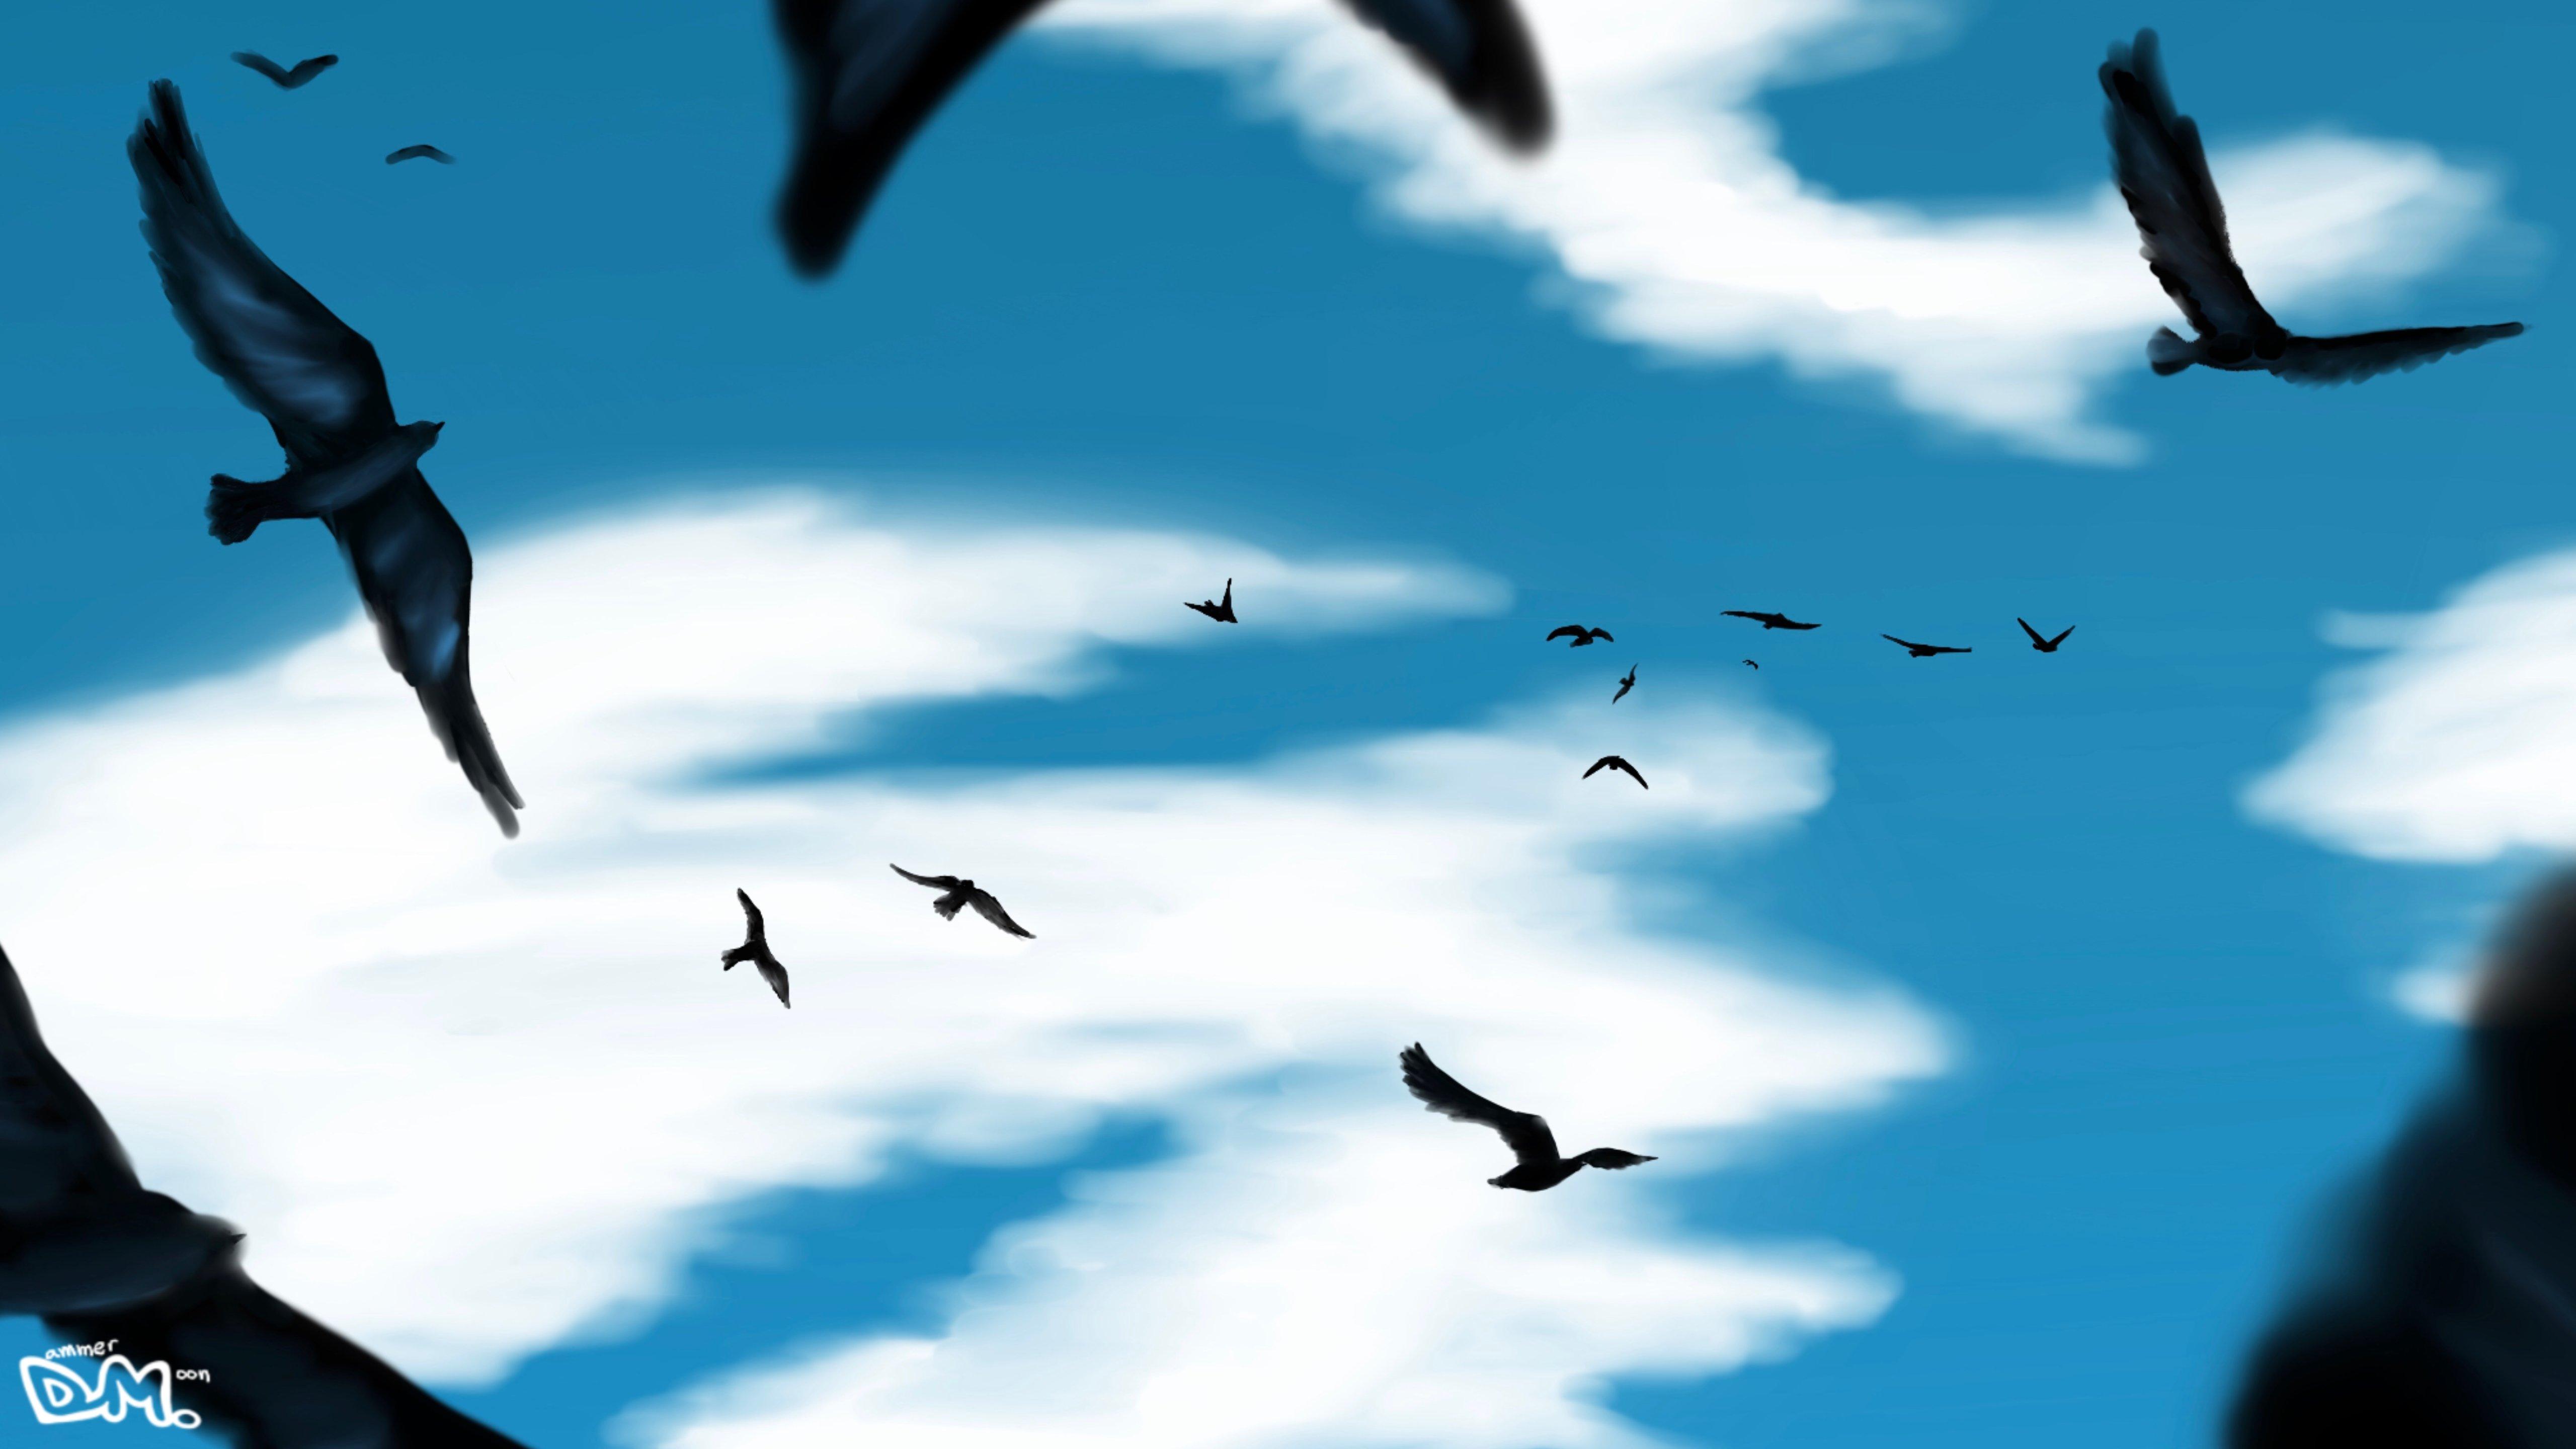 Wallpaper Birds flying in the sky